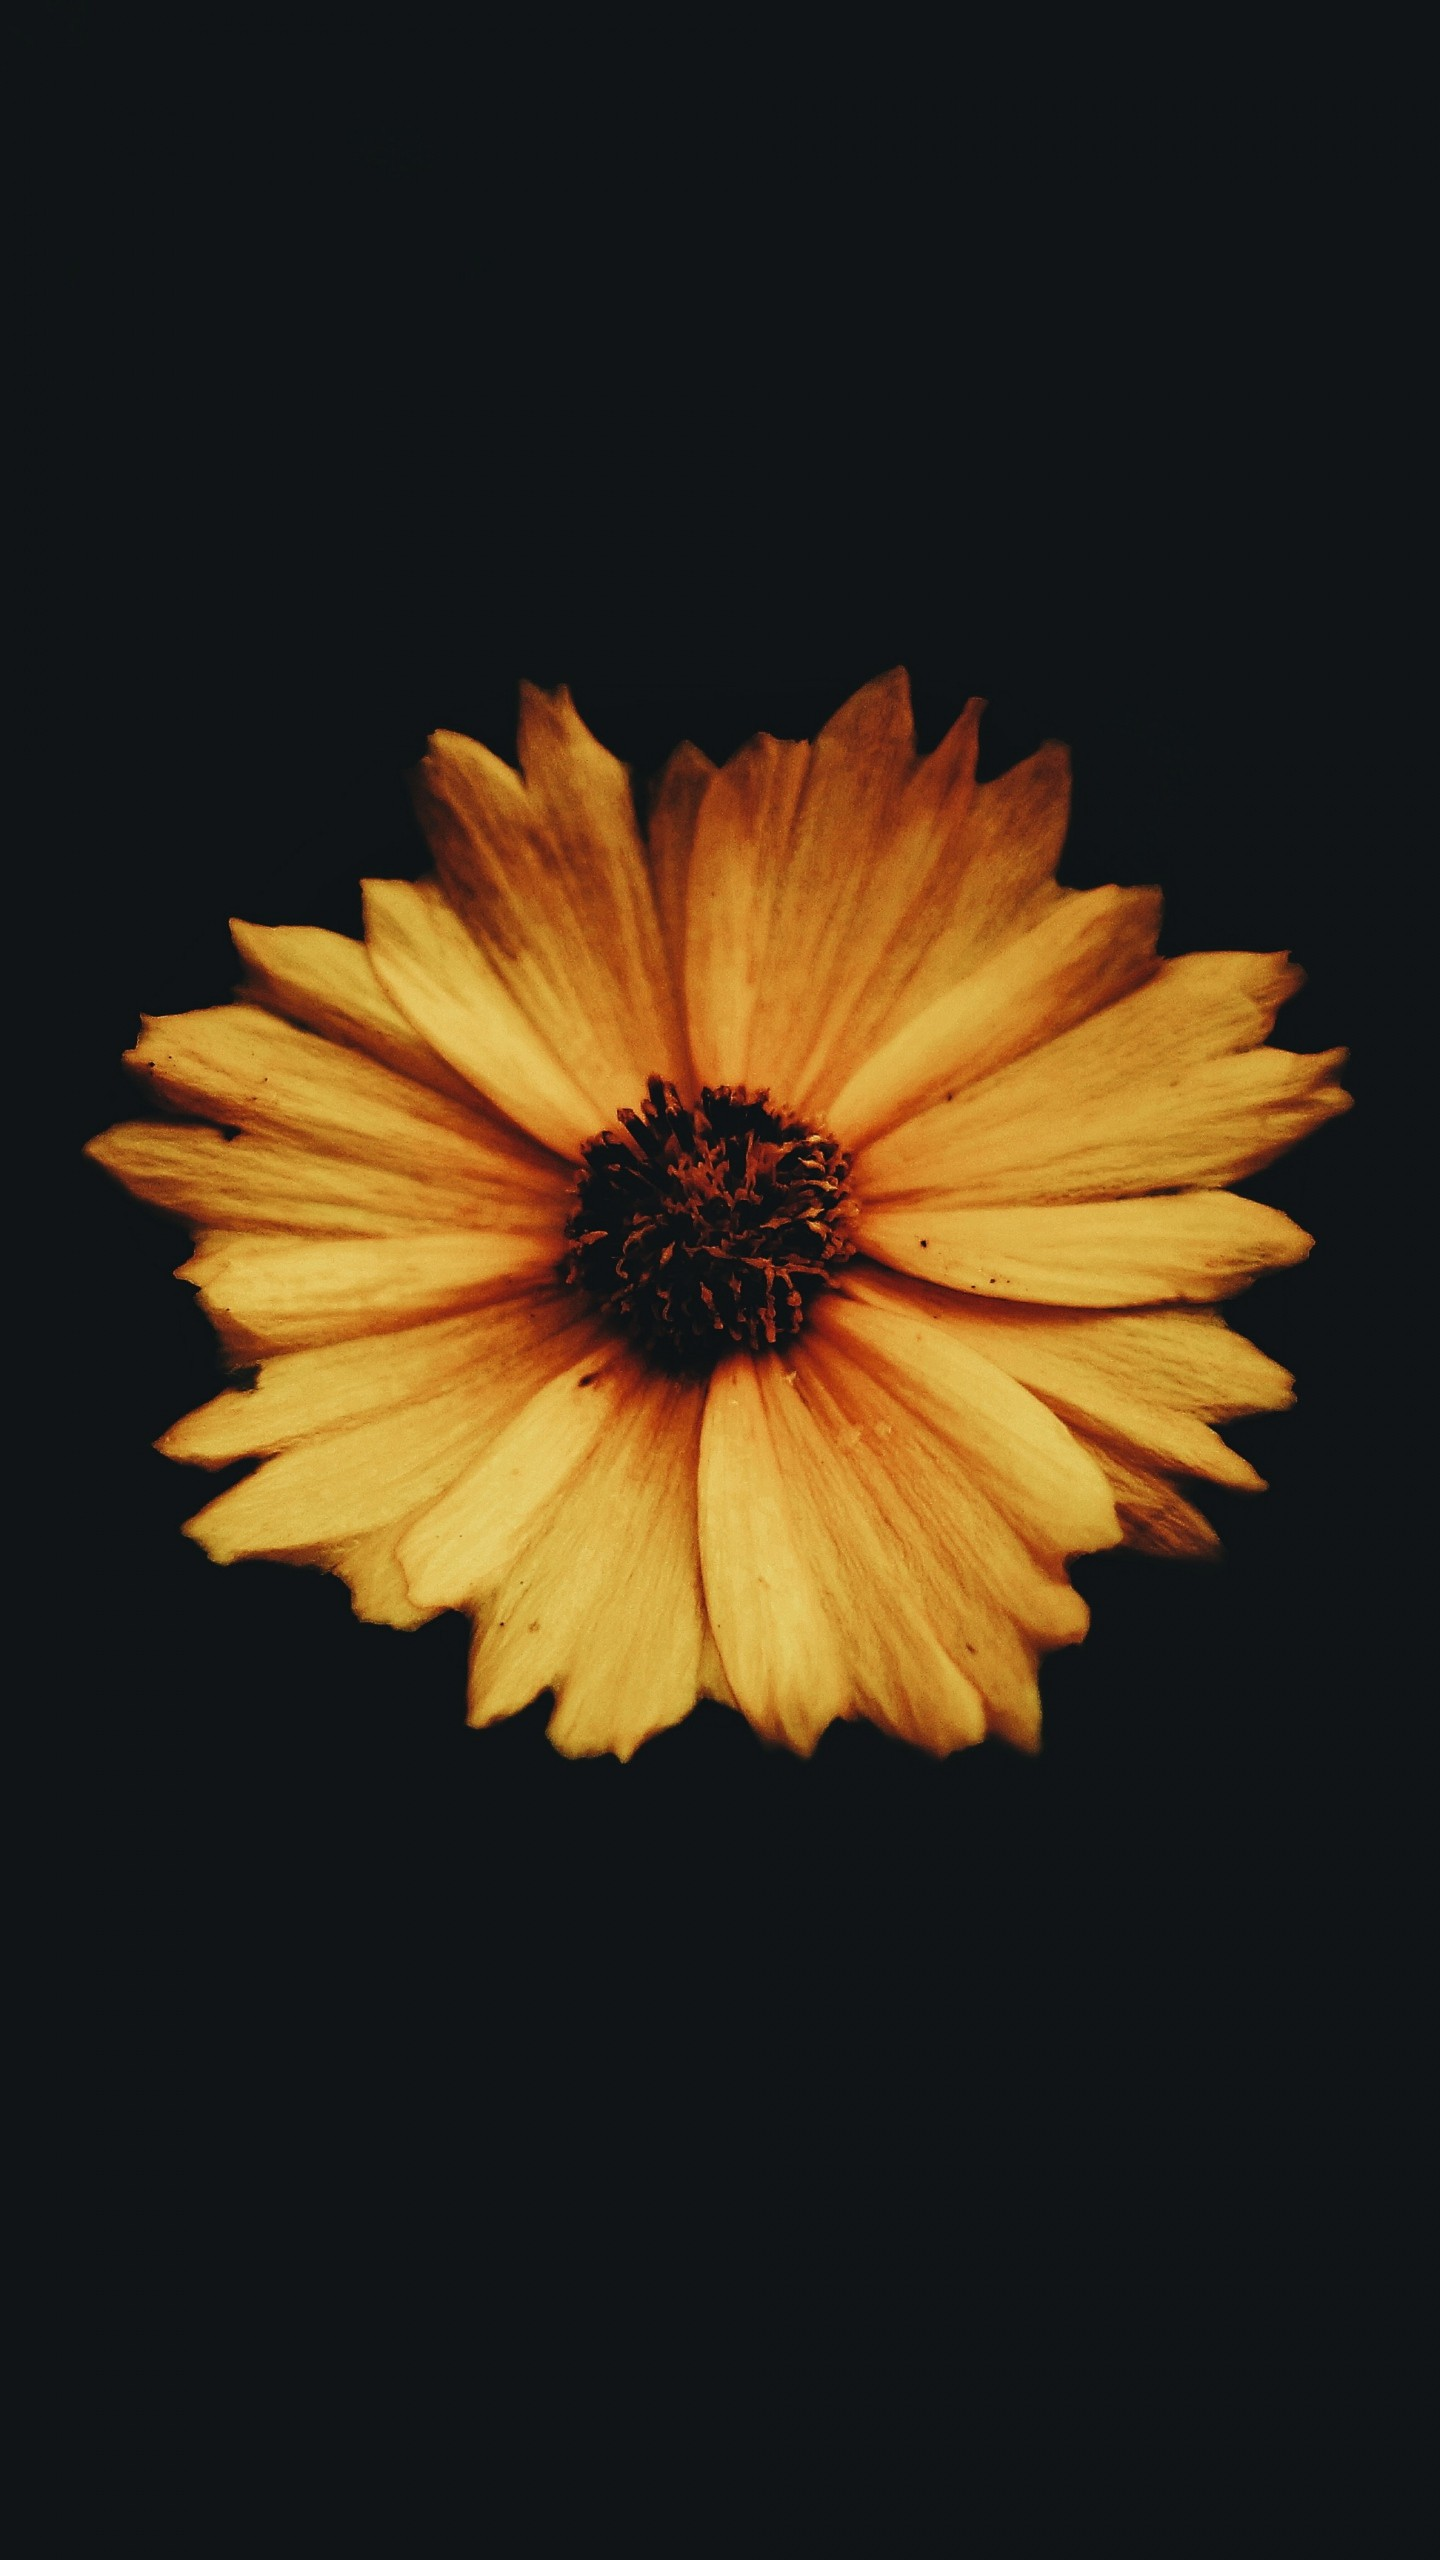 Flower Bud Petals Dark Background Wallpaper